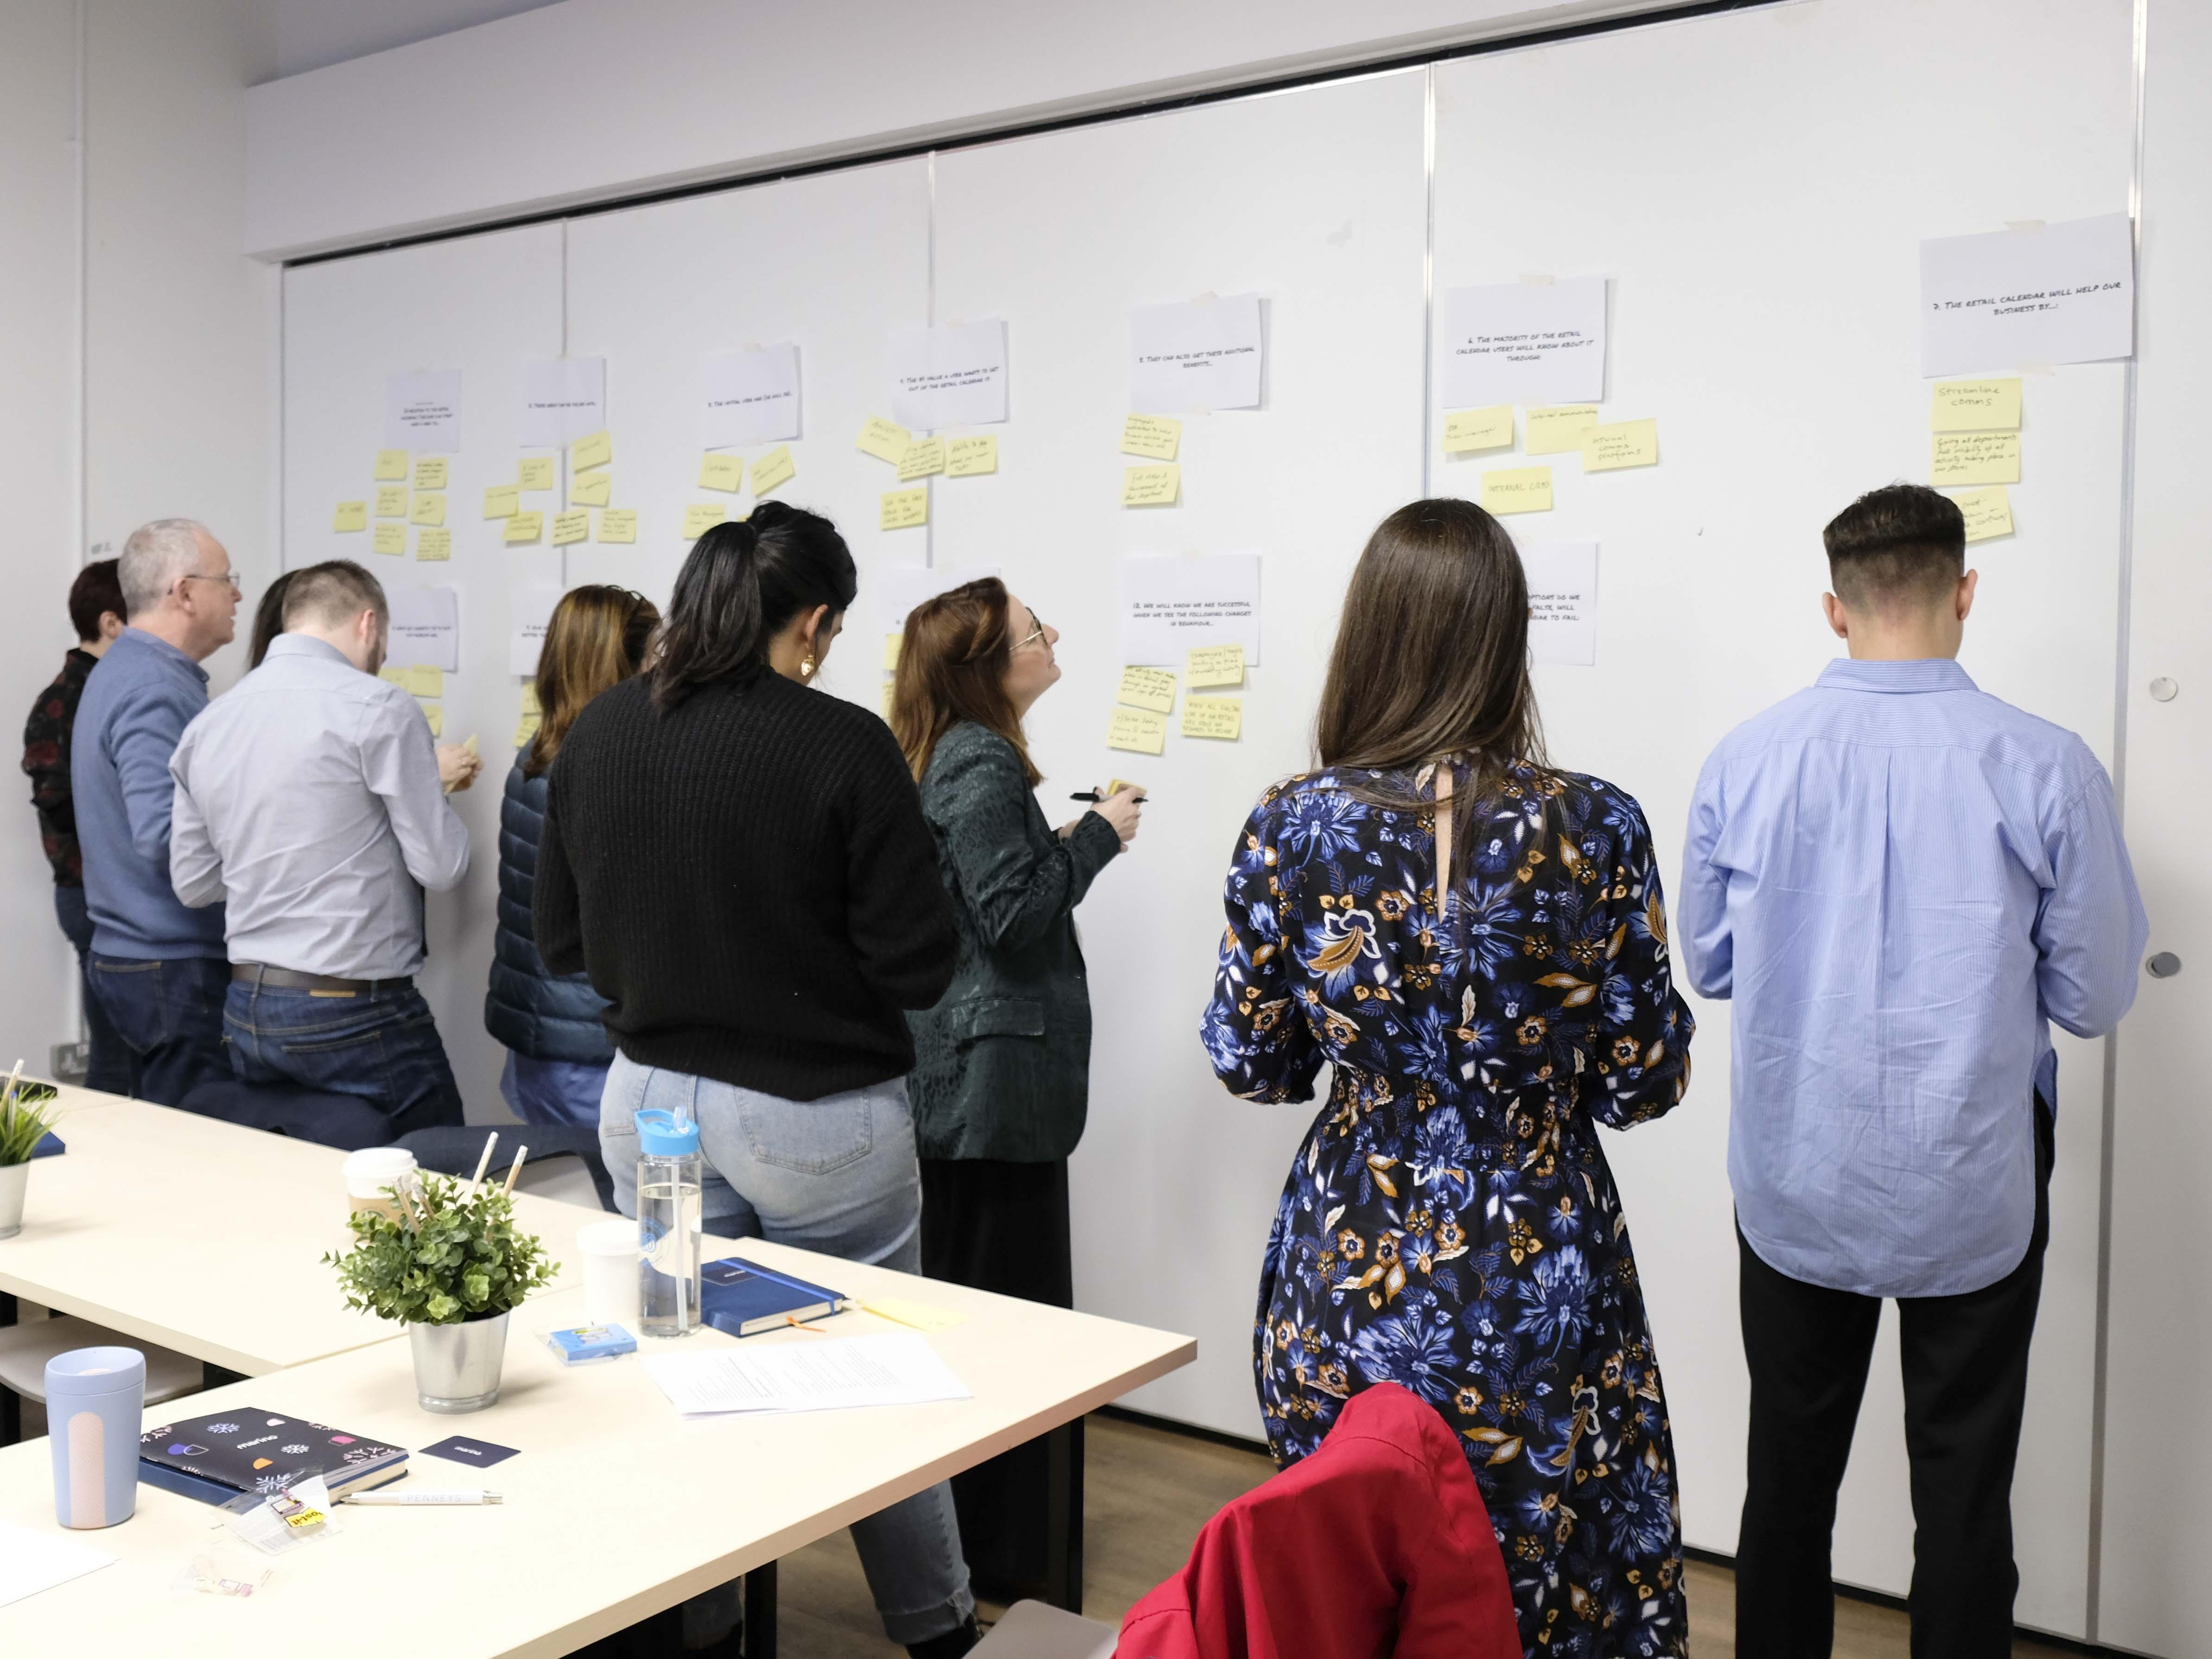 A Design Sprint Workshop